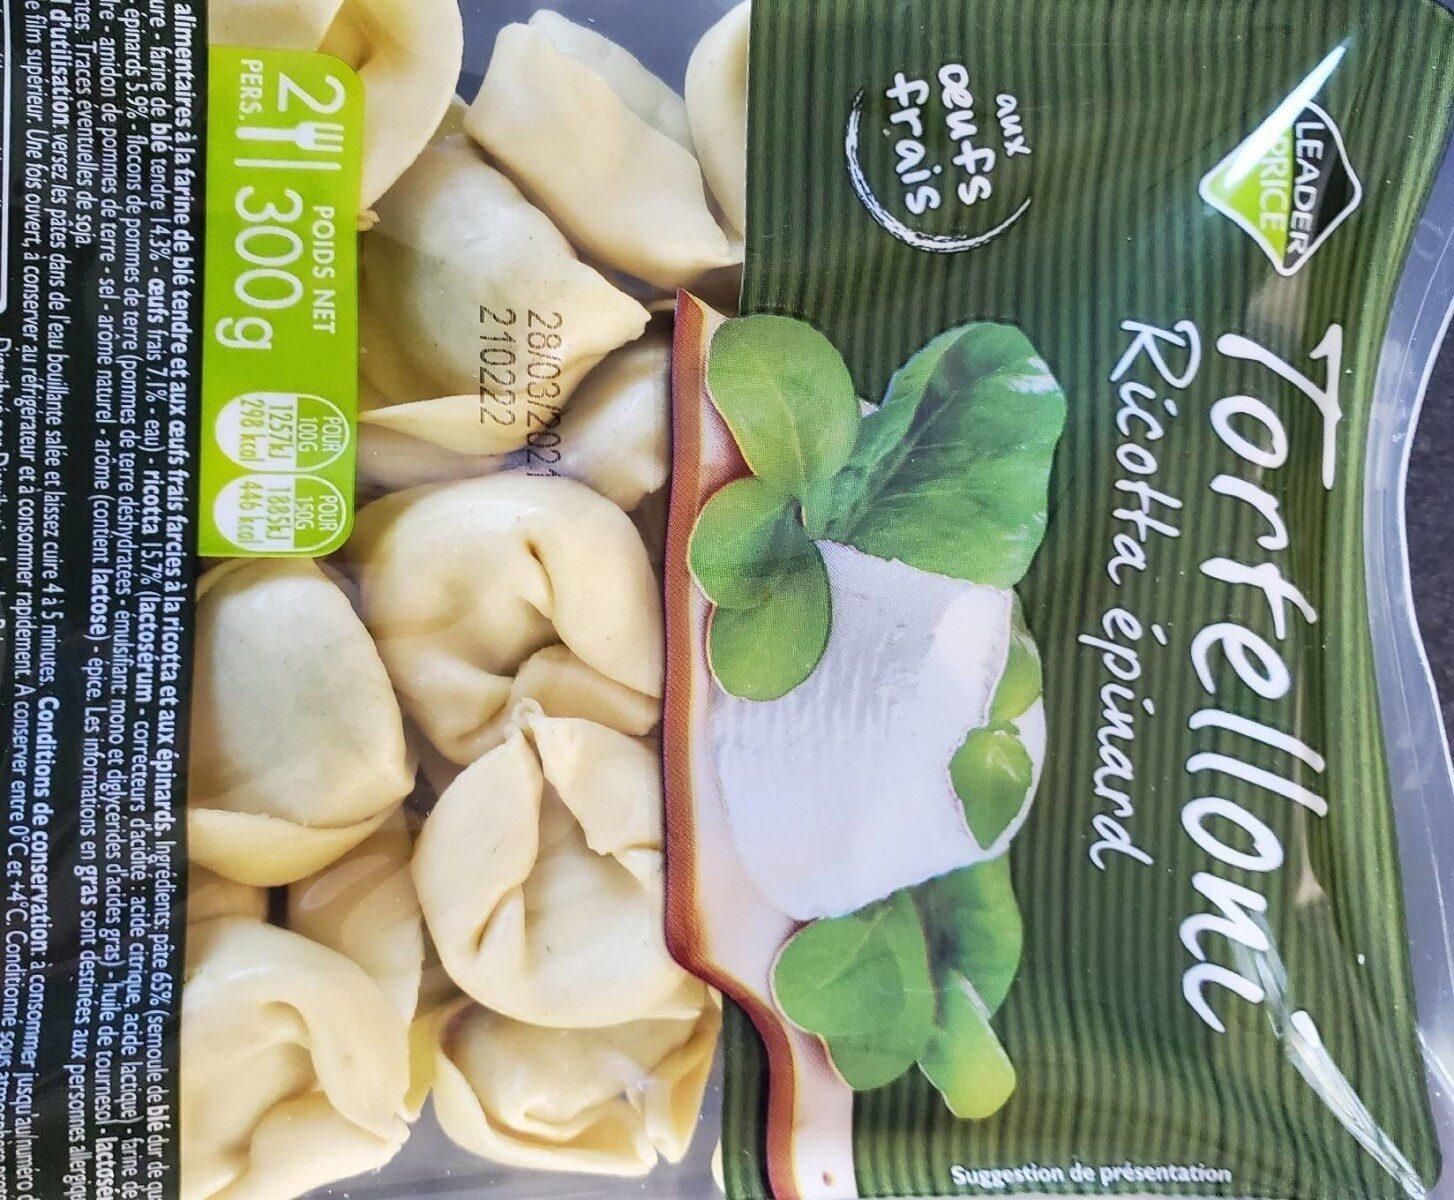 Tortelloni ricotta épinards - Prodotto - fr